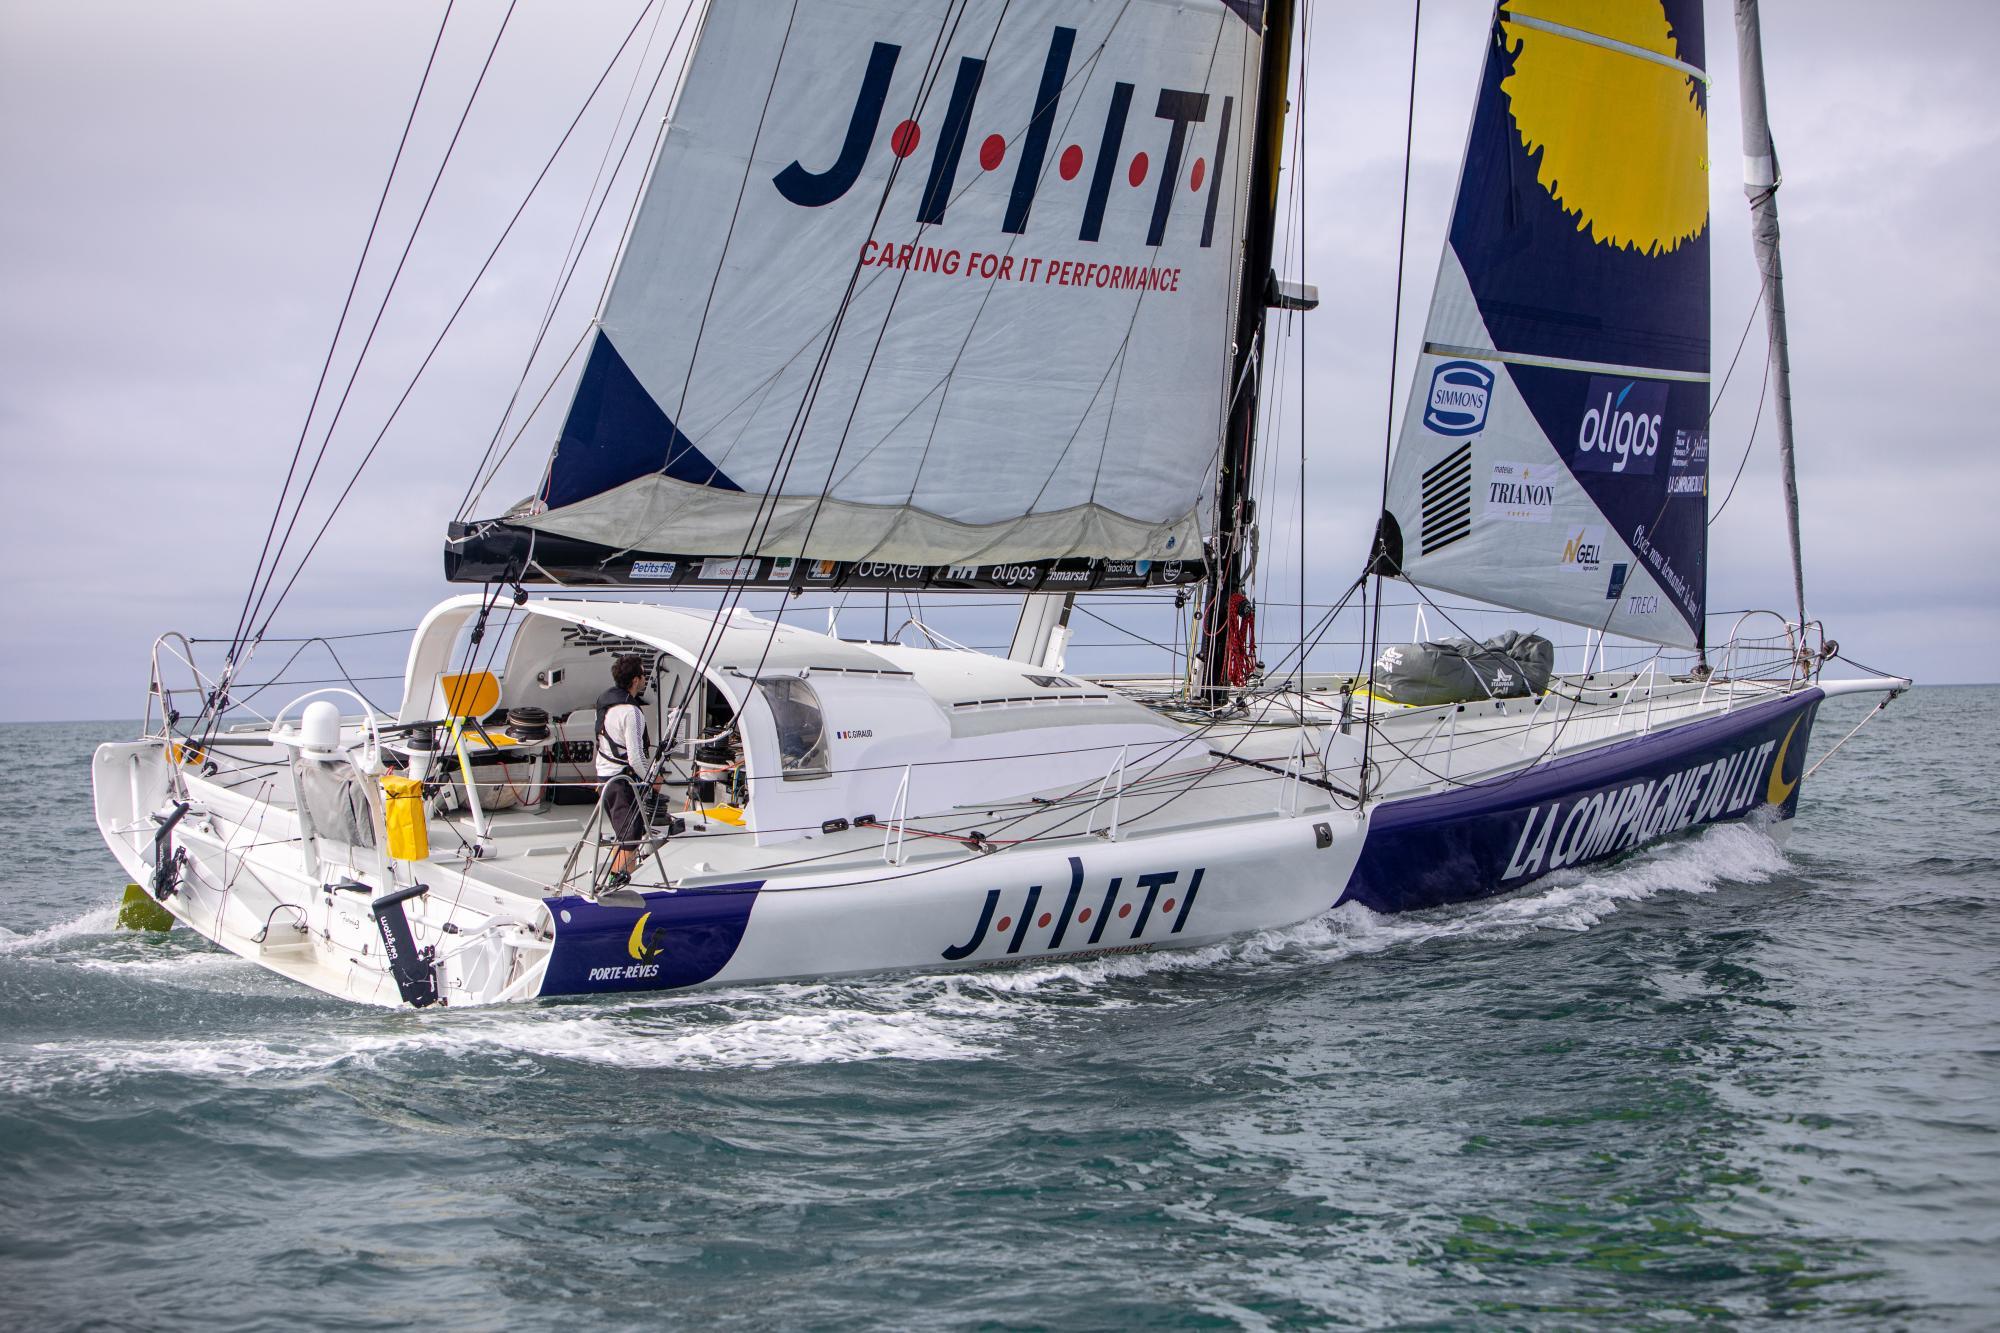 IMOCA Compagnie du Lit / Jiliti - Clément Giraud © Vincent Olivaud